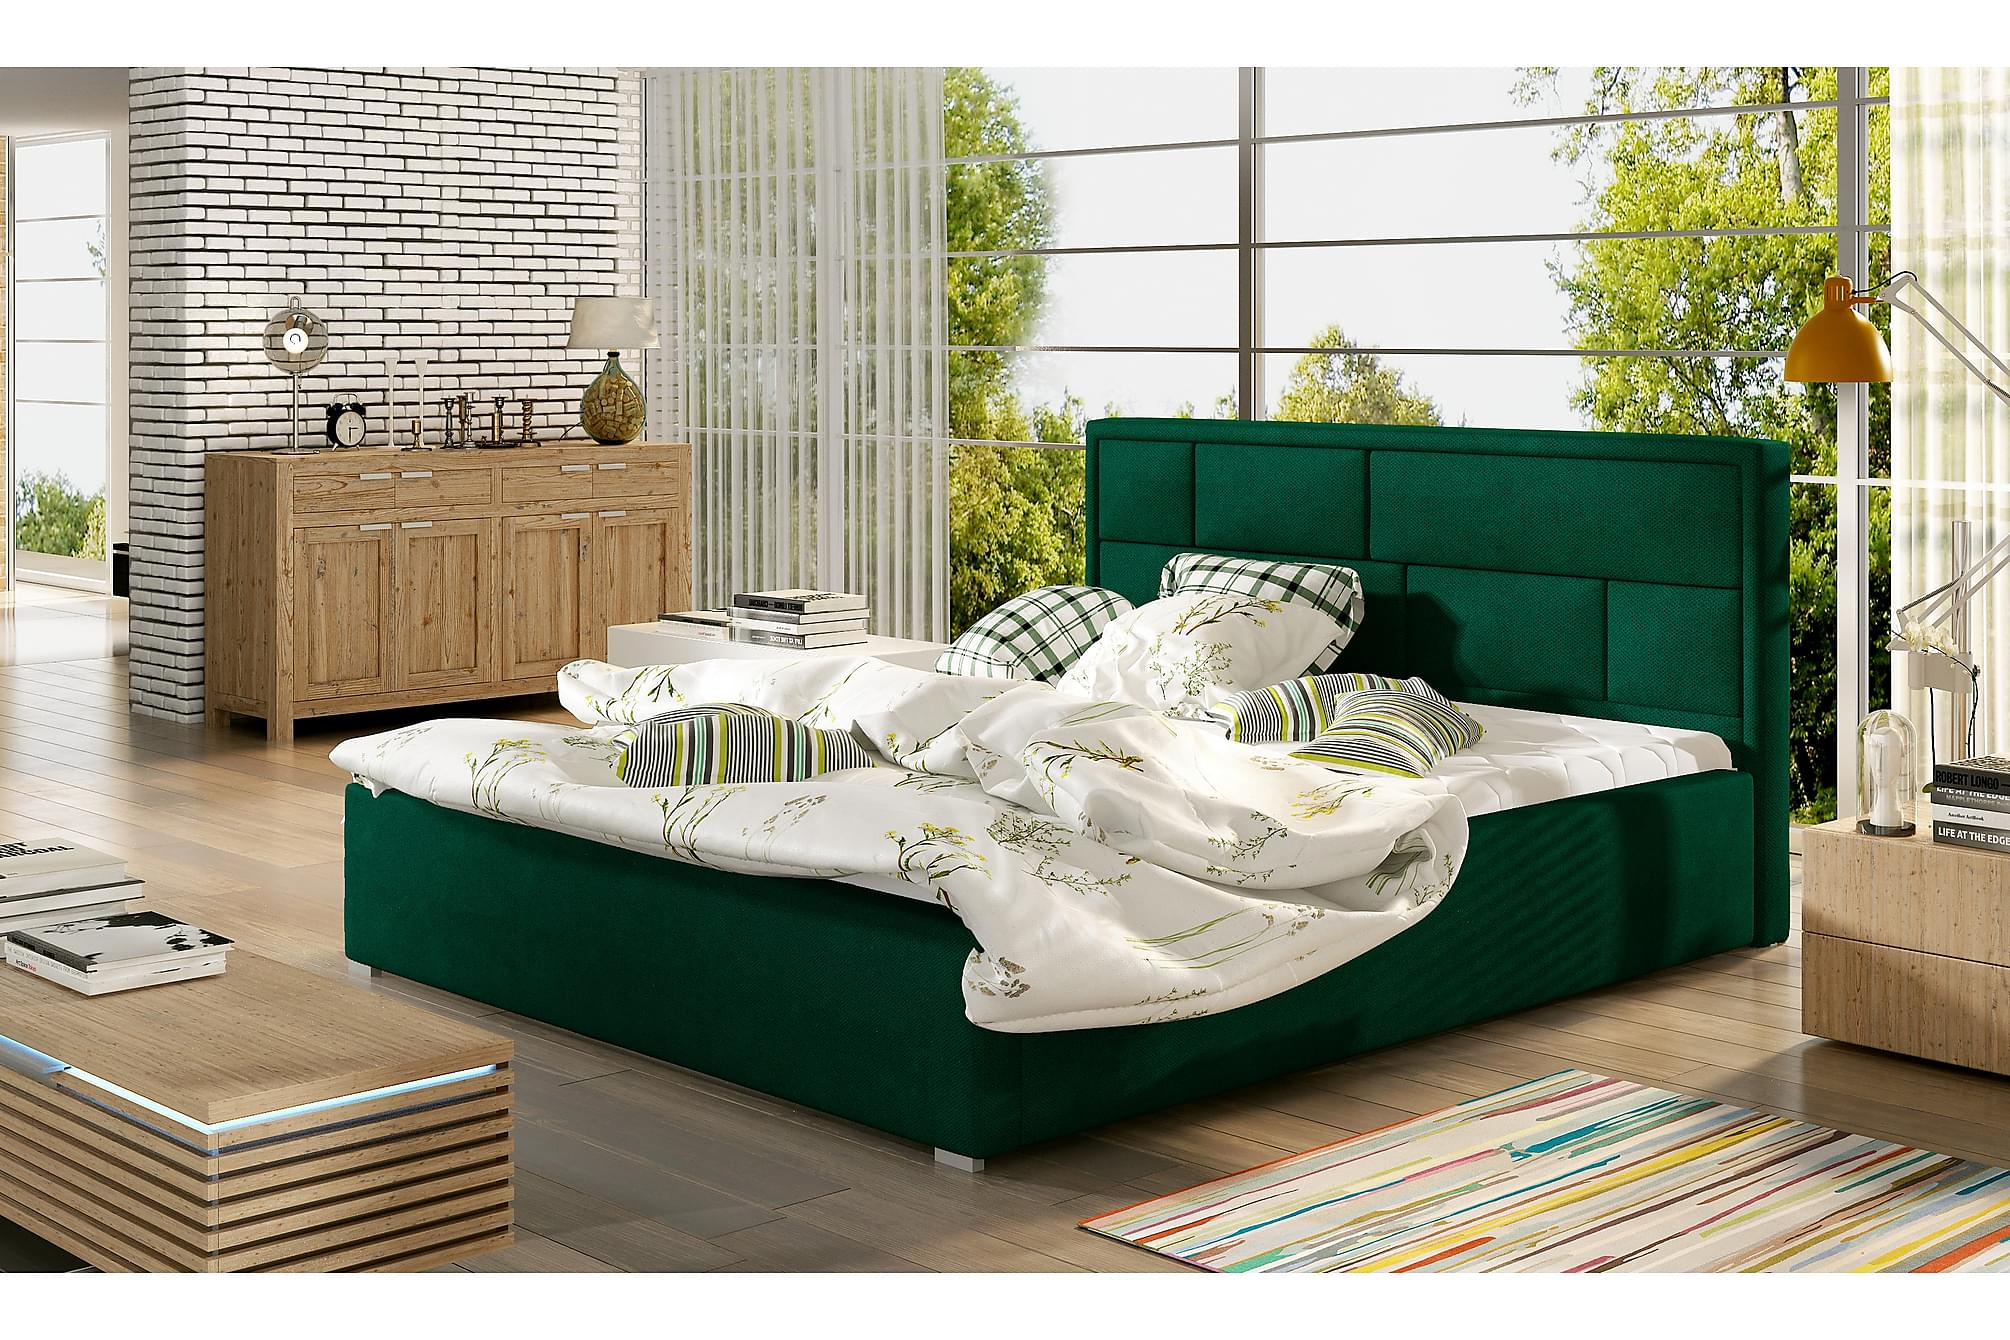 AGULLANA Sängram 140x200 cm Grön, Sängram & sängstomme